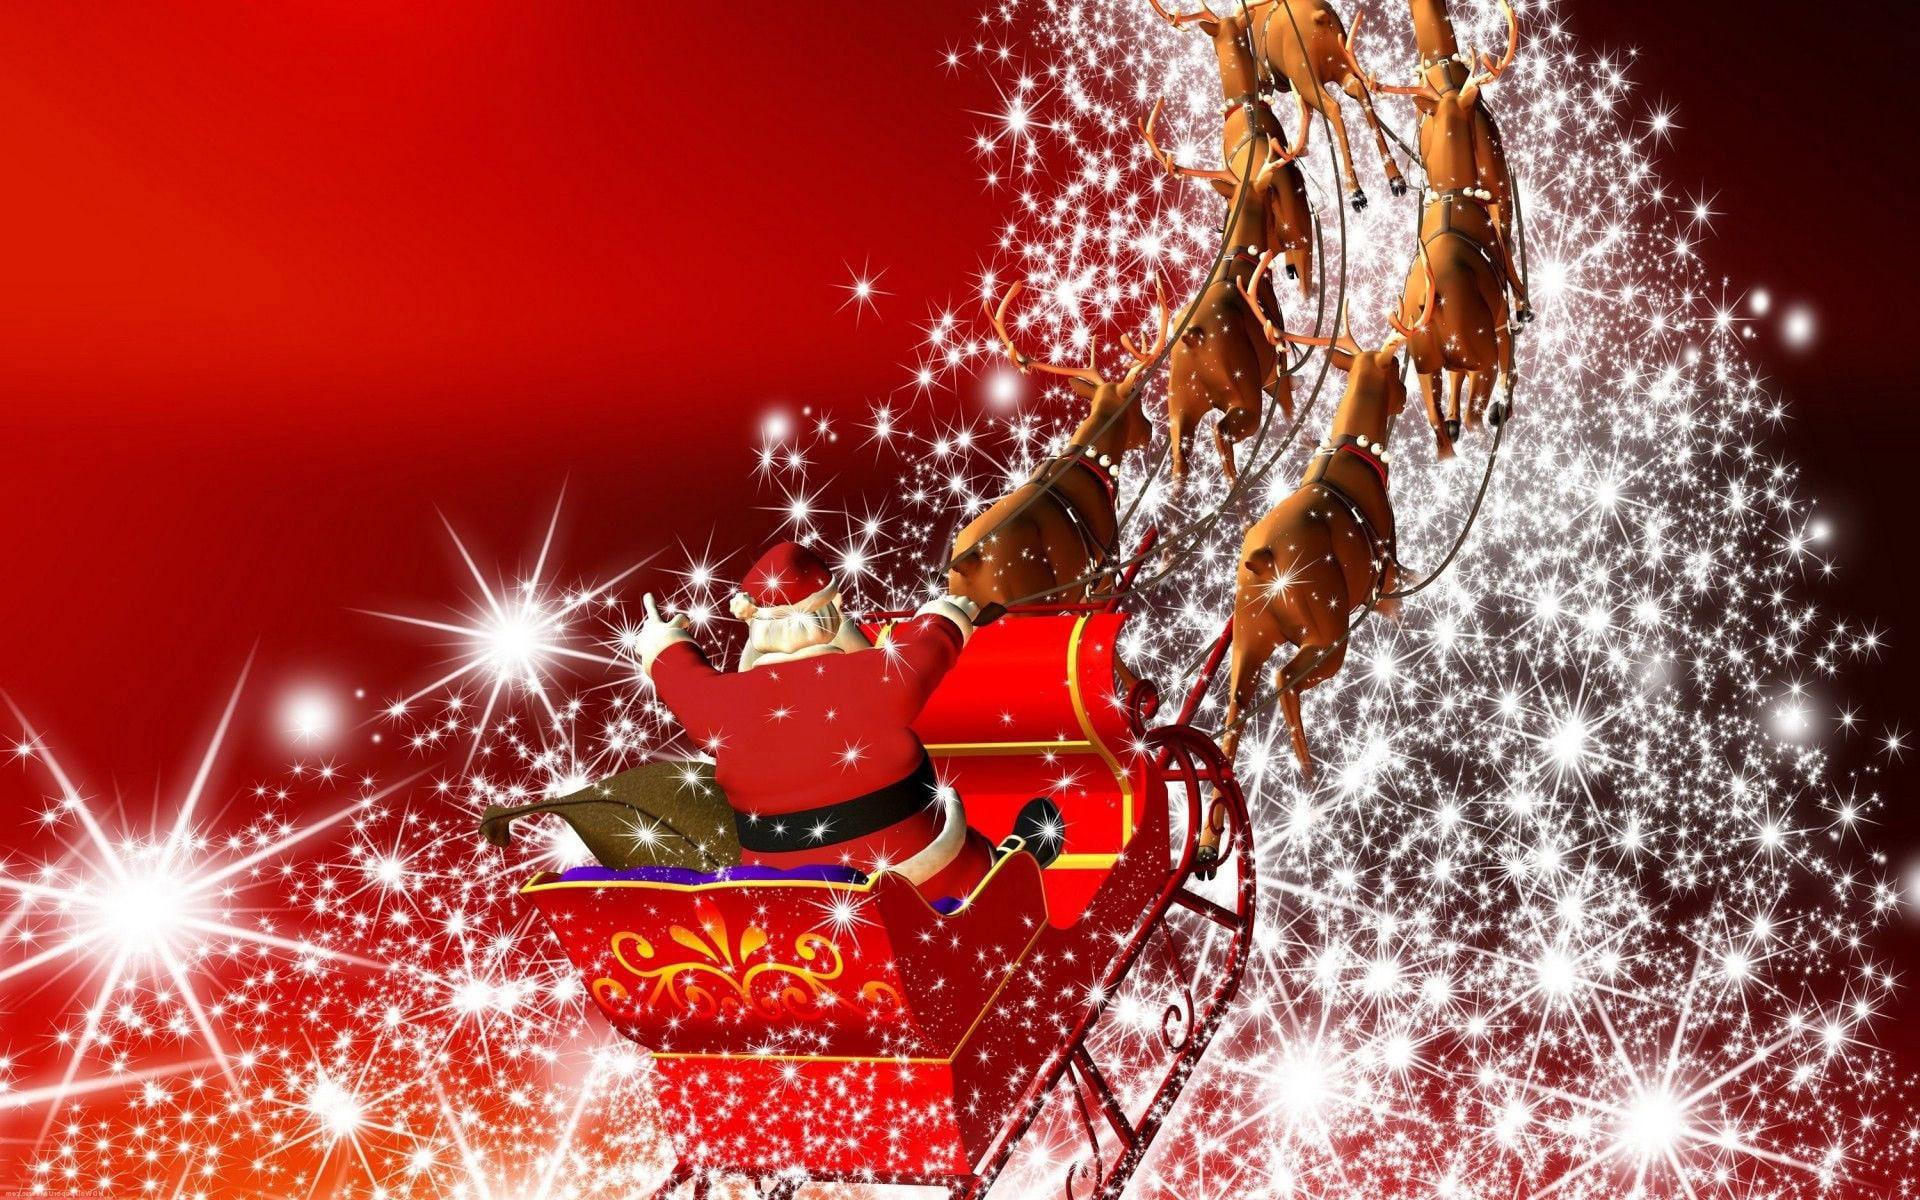 Santa Claus HQ wallpapers